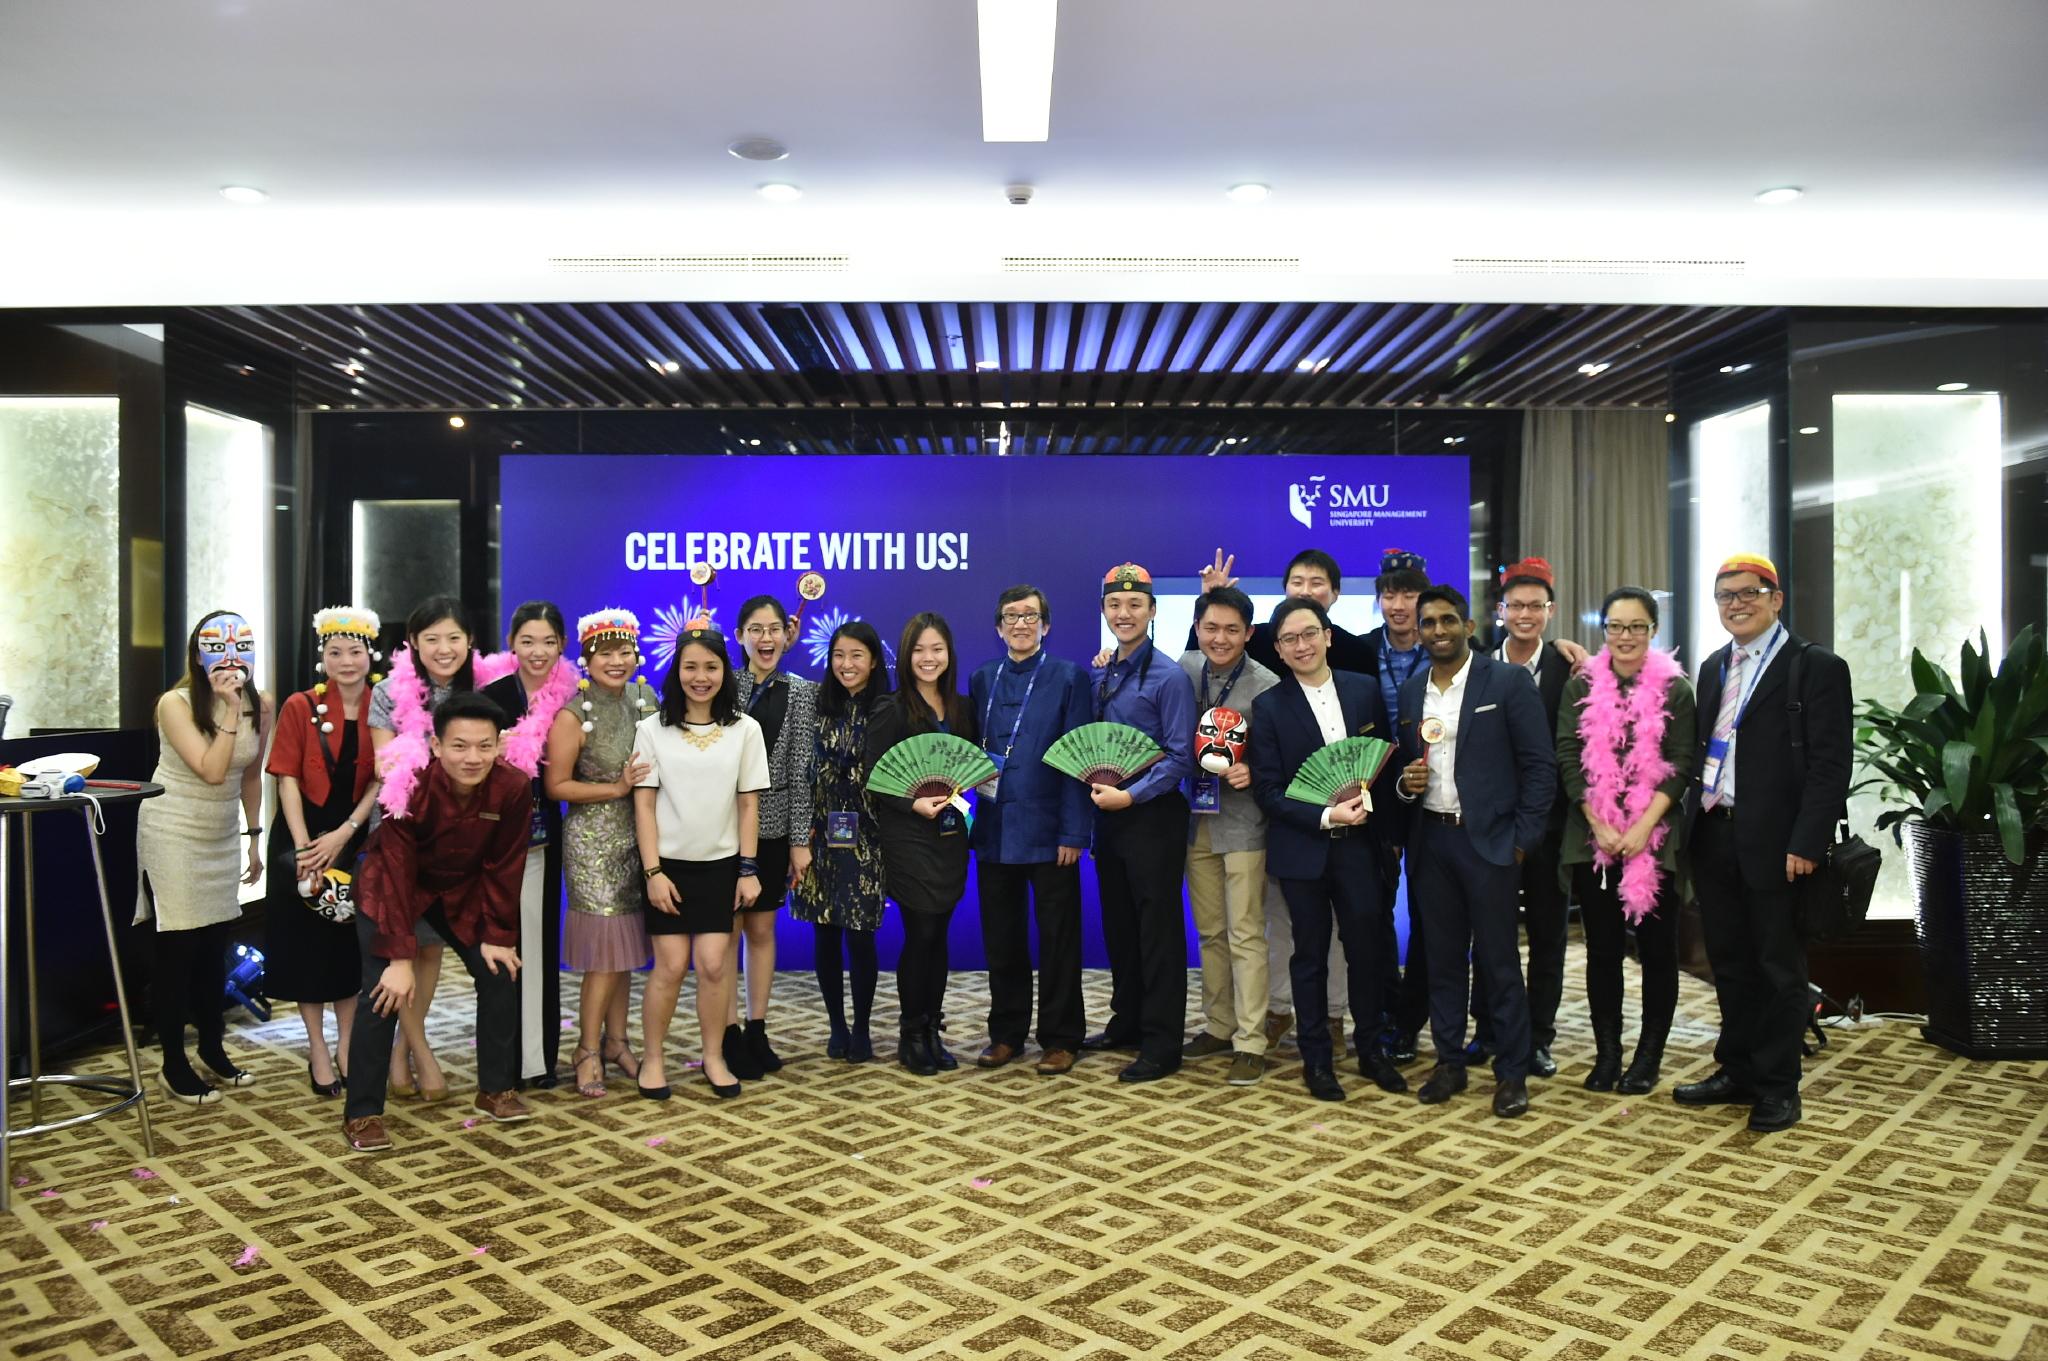 APAIE Conference in Beijing, 2015